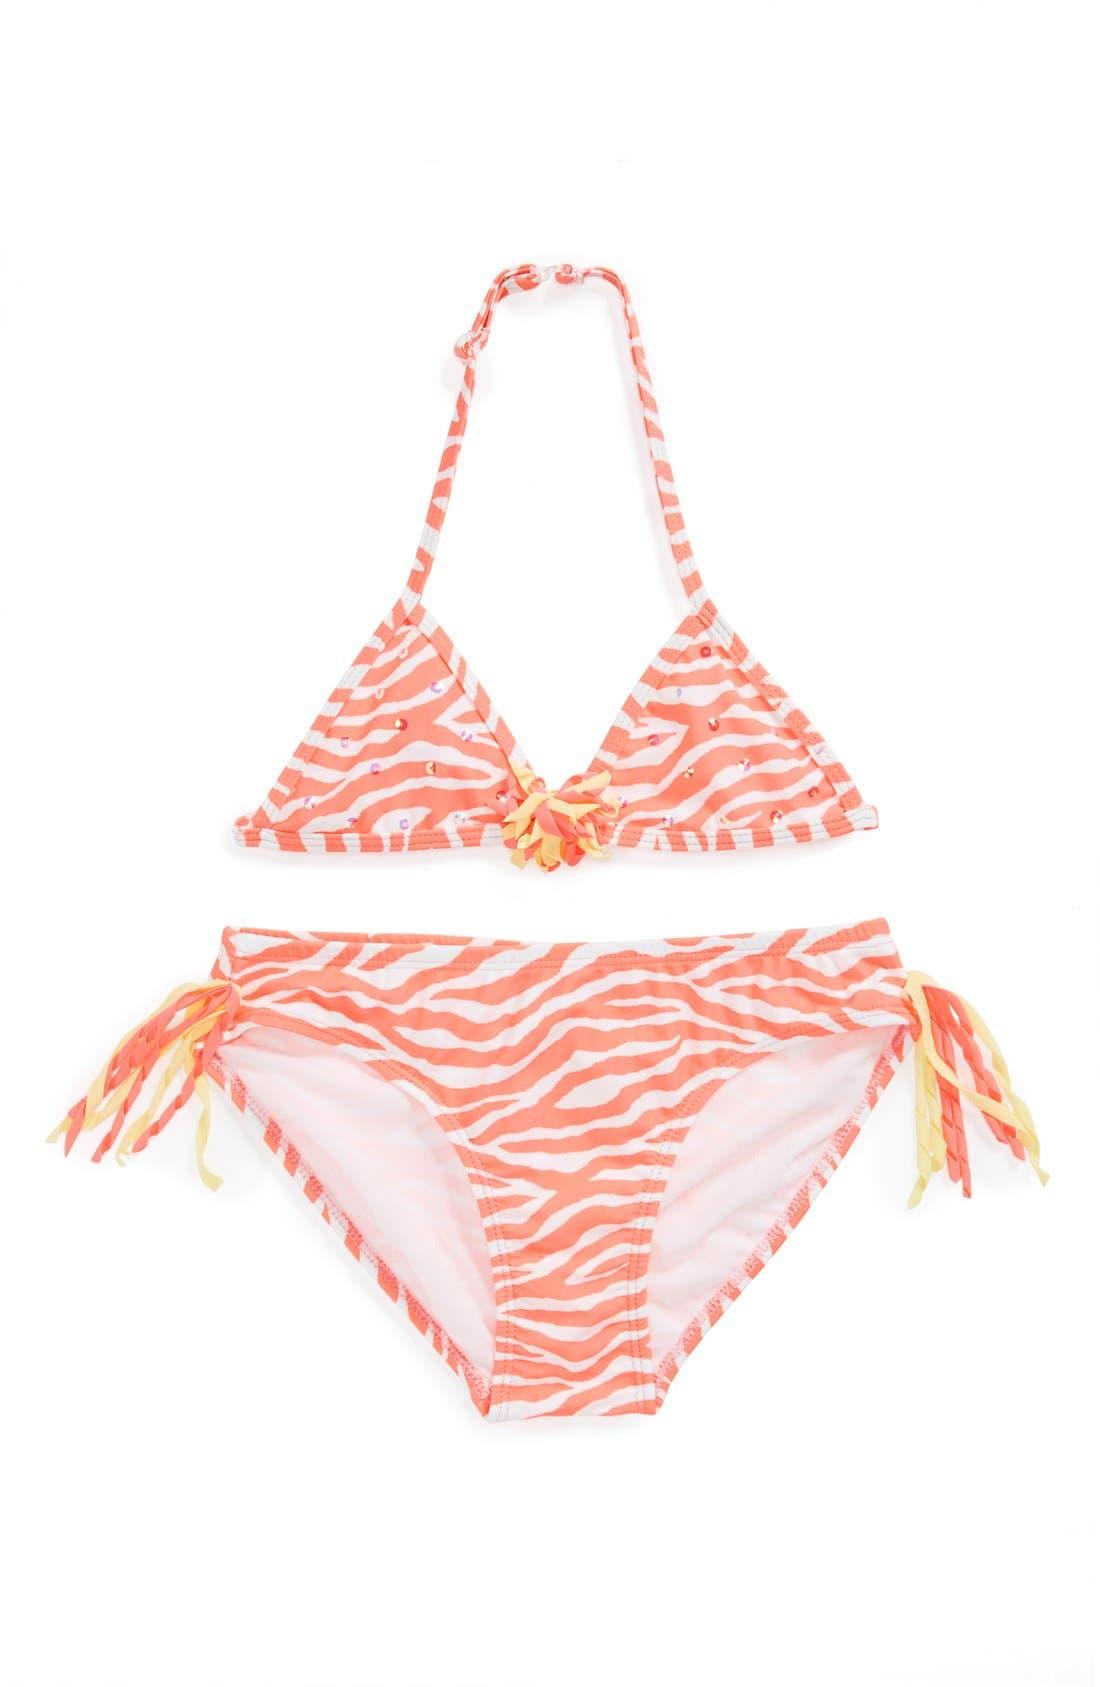 Alternate Image 1 Selected - Kate Mack 'Tahitian Sunset' Two-Piece Swimsuit (Big Girls)